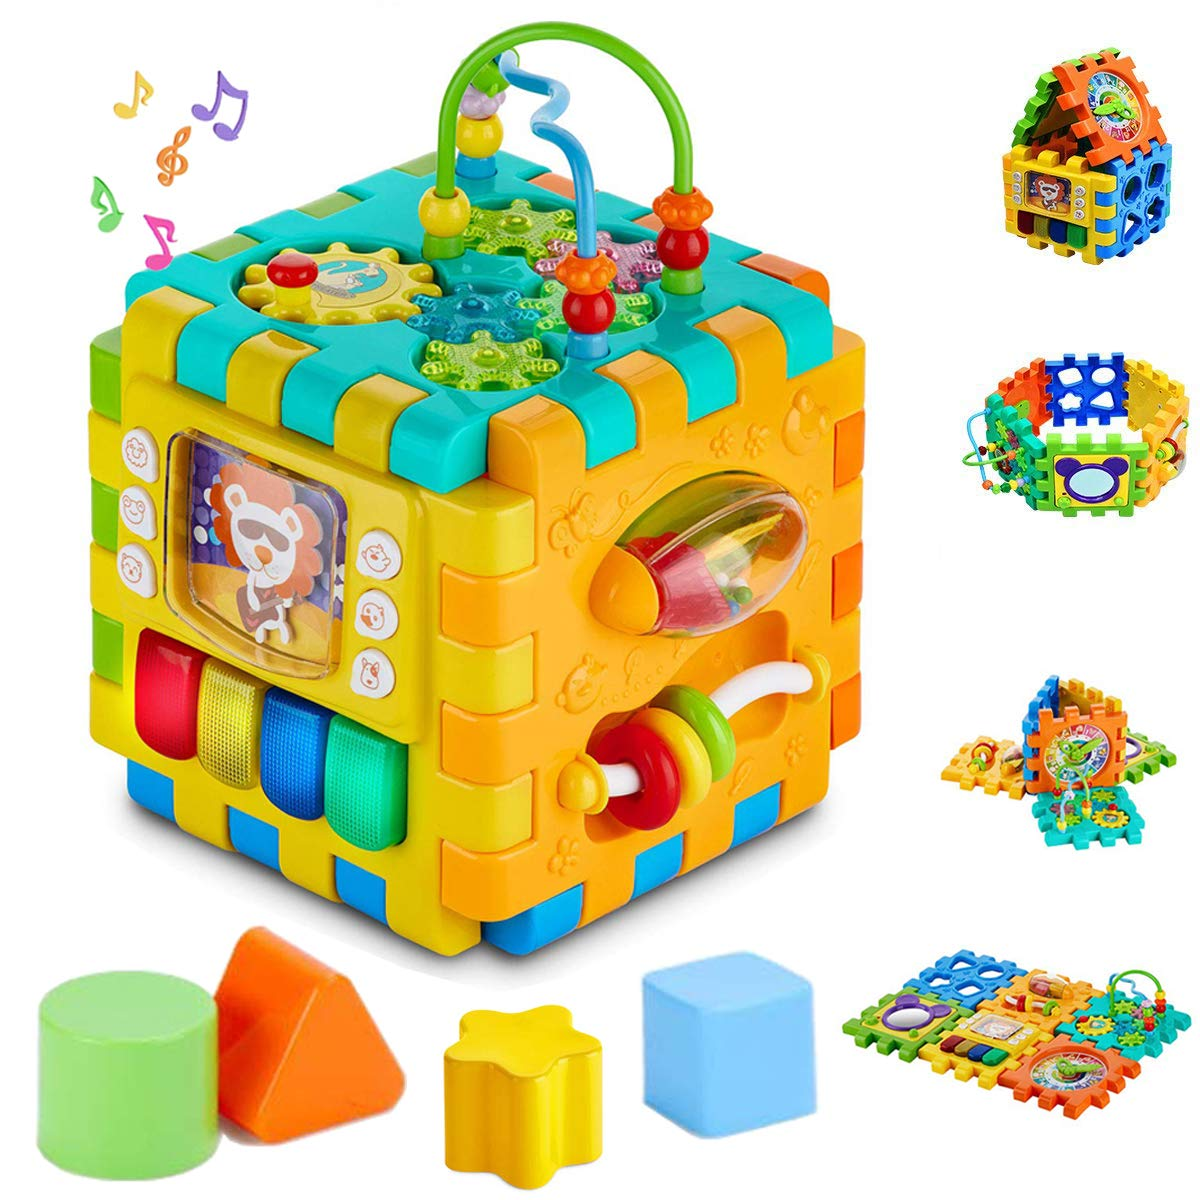 ELC Wooden Shape Sorter Kids Learning Activity Toys Birthday Christmas Gift